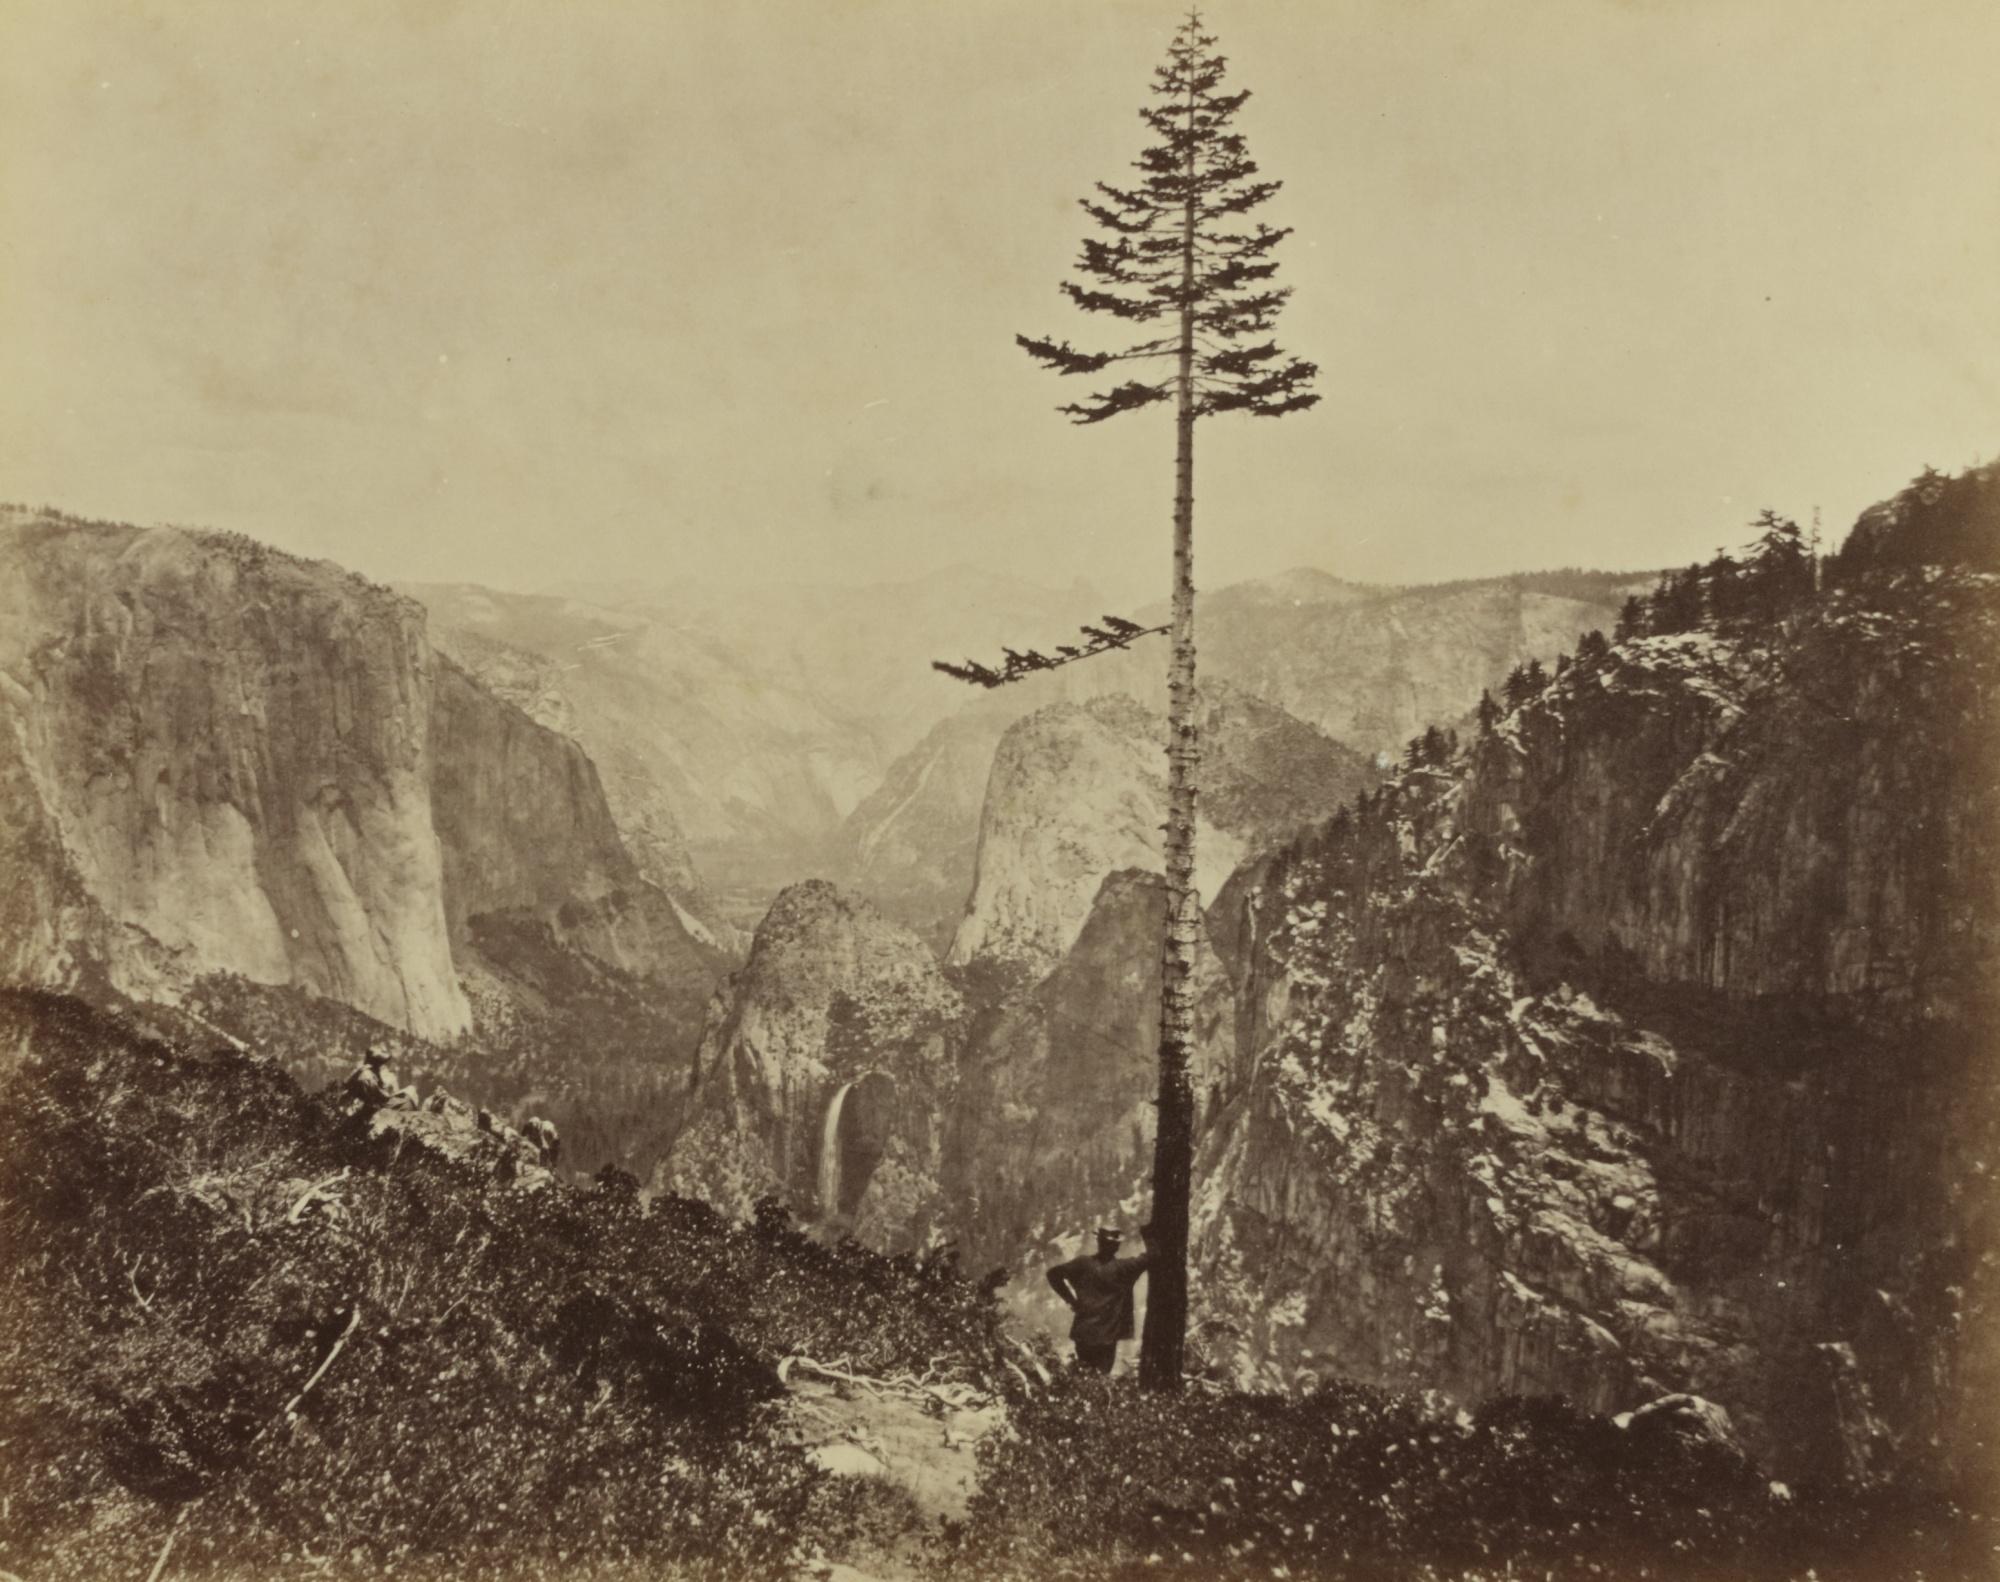 Charles Leander Weed-Selected Images-1880